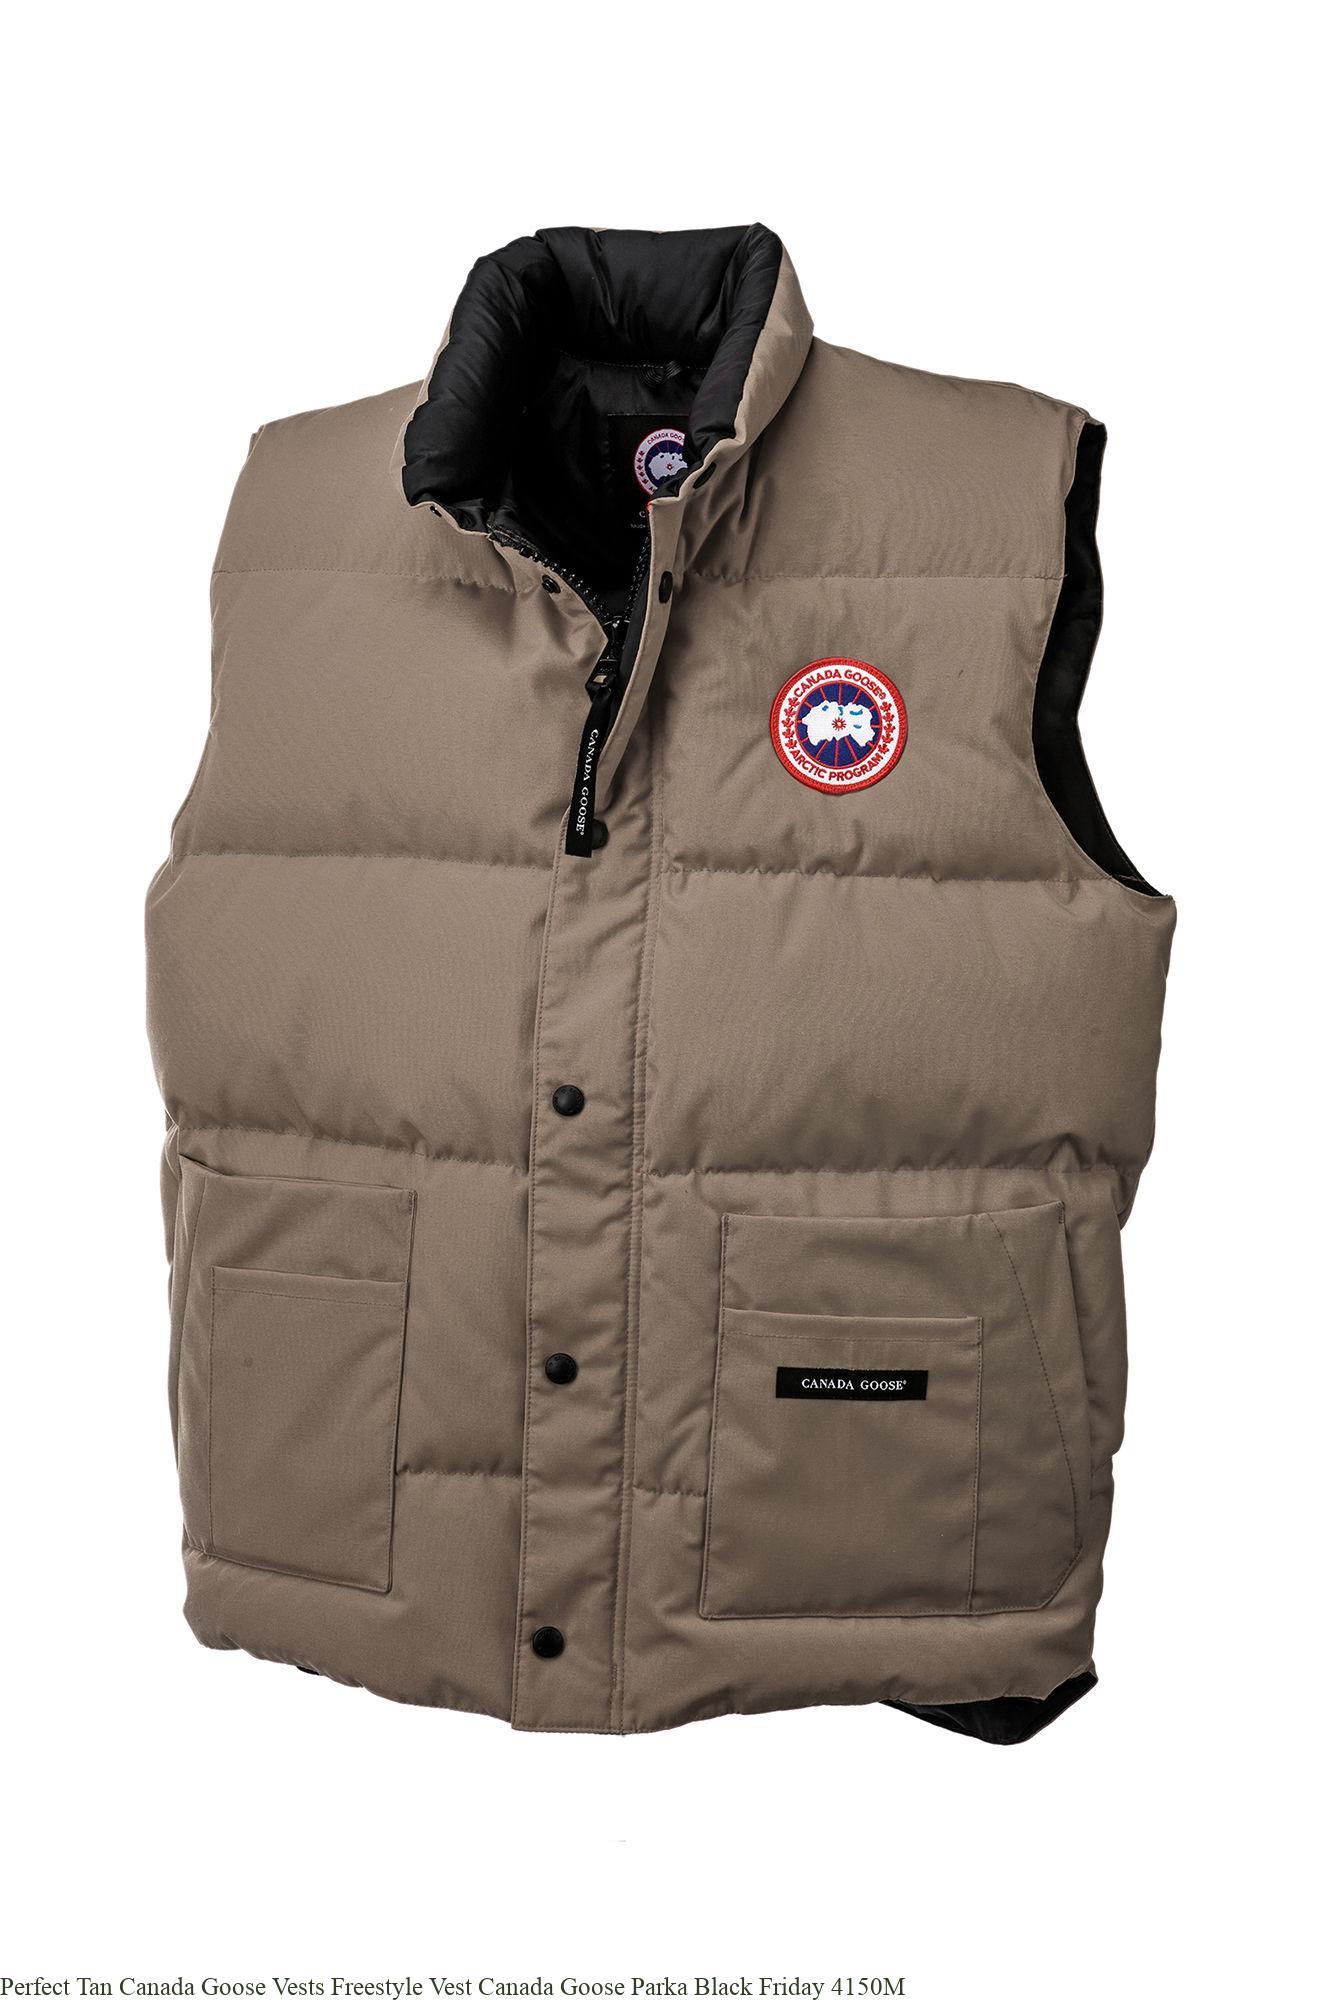 6f6b5cda0ce Perfect Tan Canada Goose Vests Freestyle Vest Canada Goose Parka Black  Friday 4150M – Canada Goose Outlet Online – Cheap Canada Goose Sale